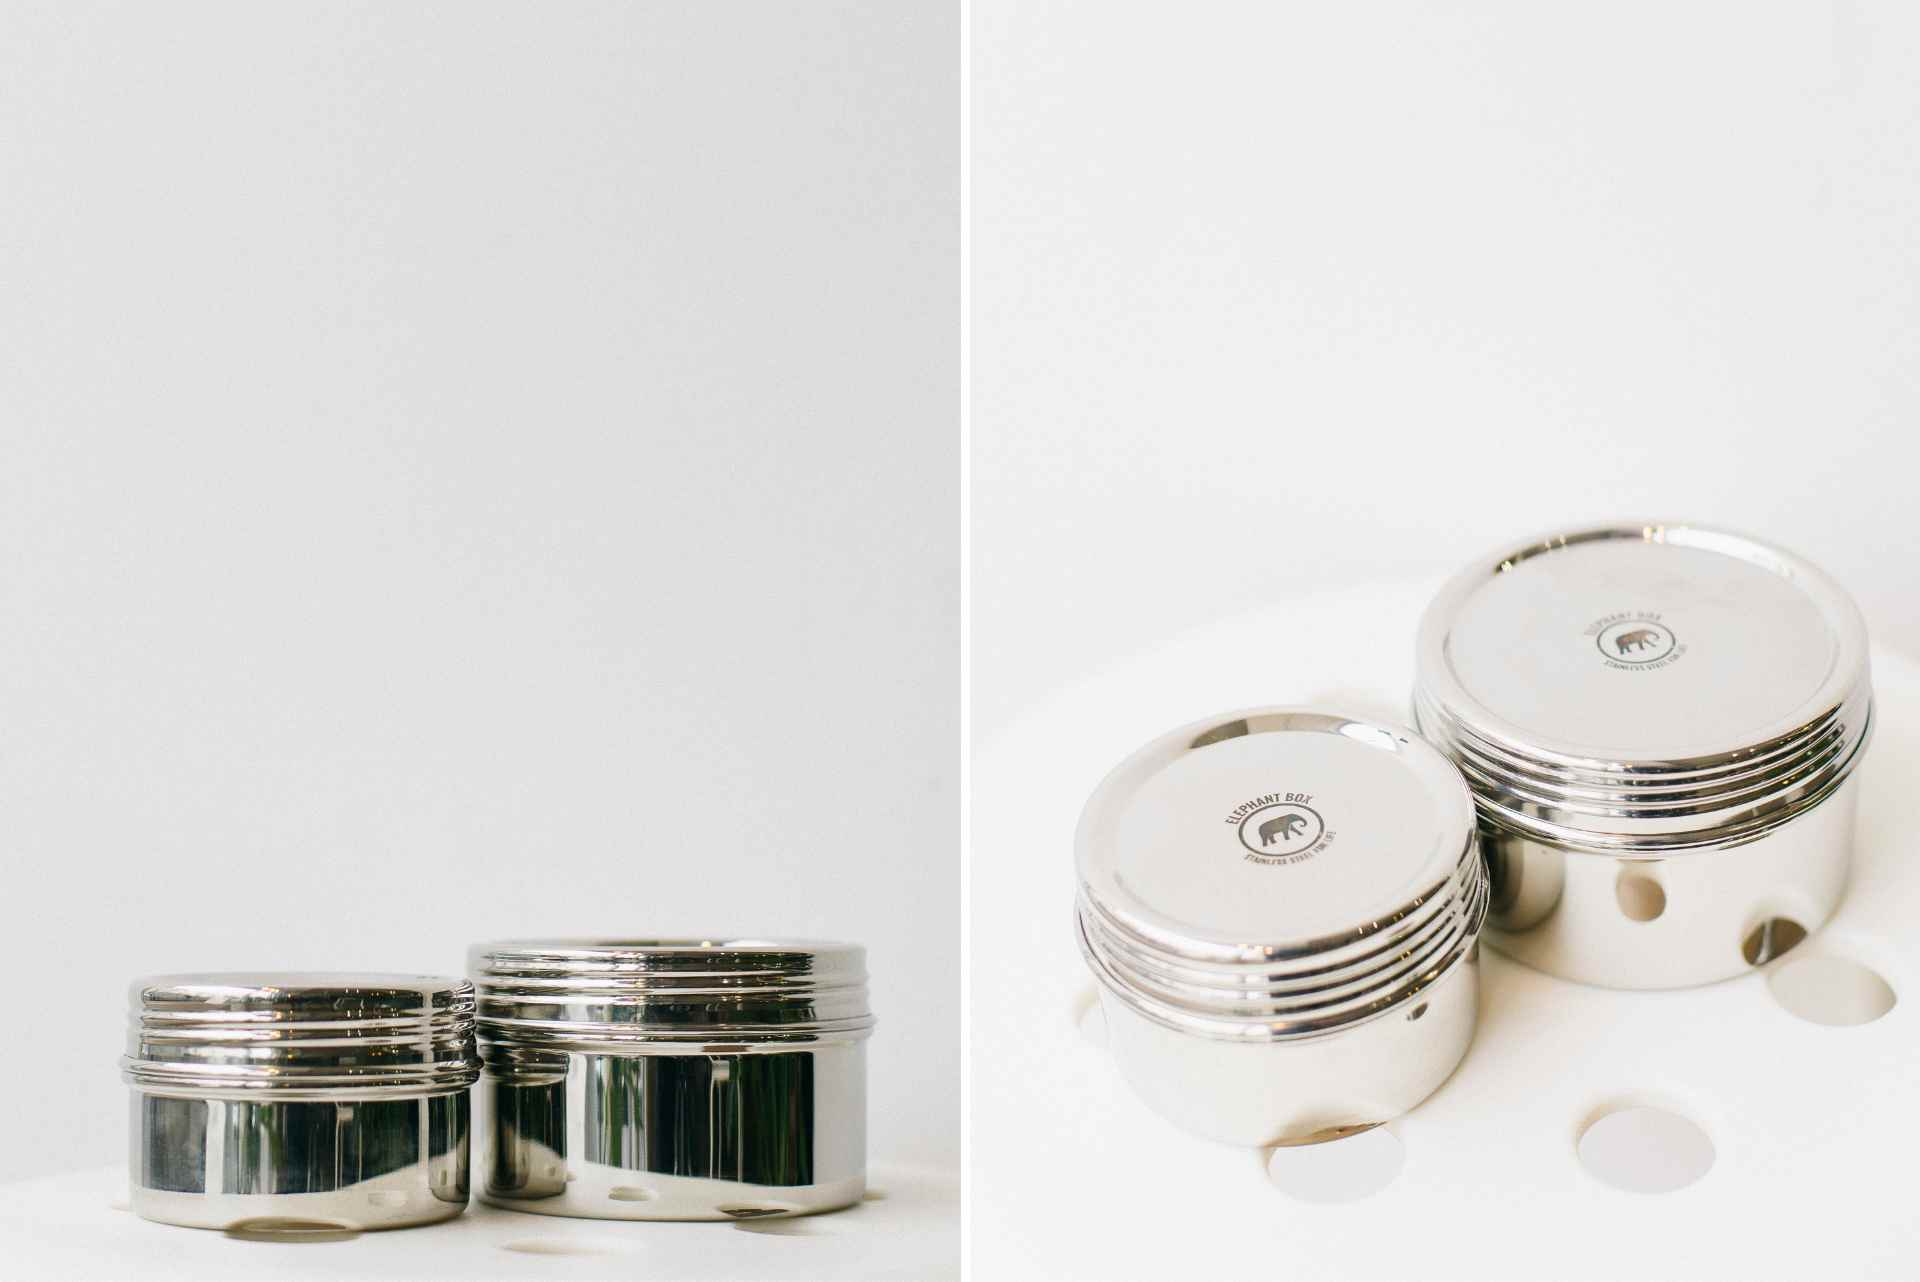 plastic-free-elephant-box-food-canisters